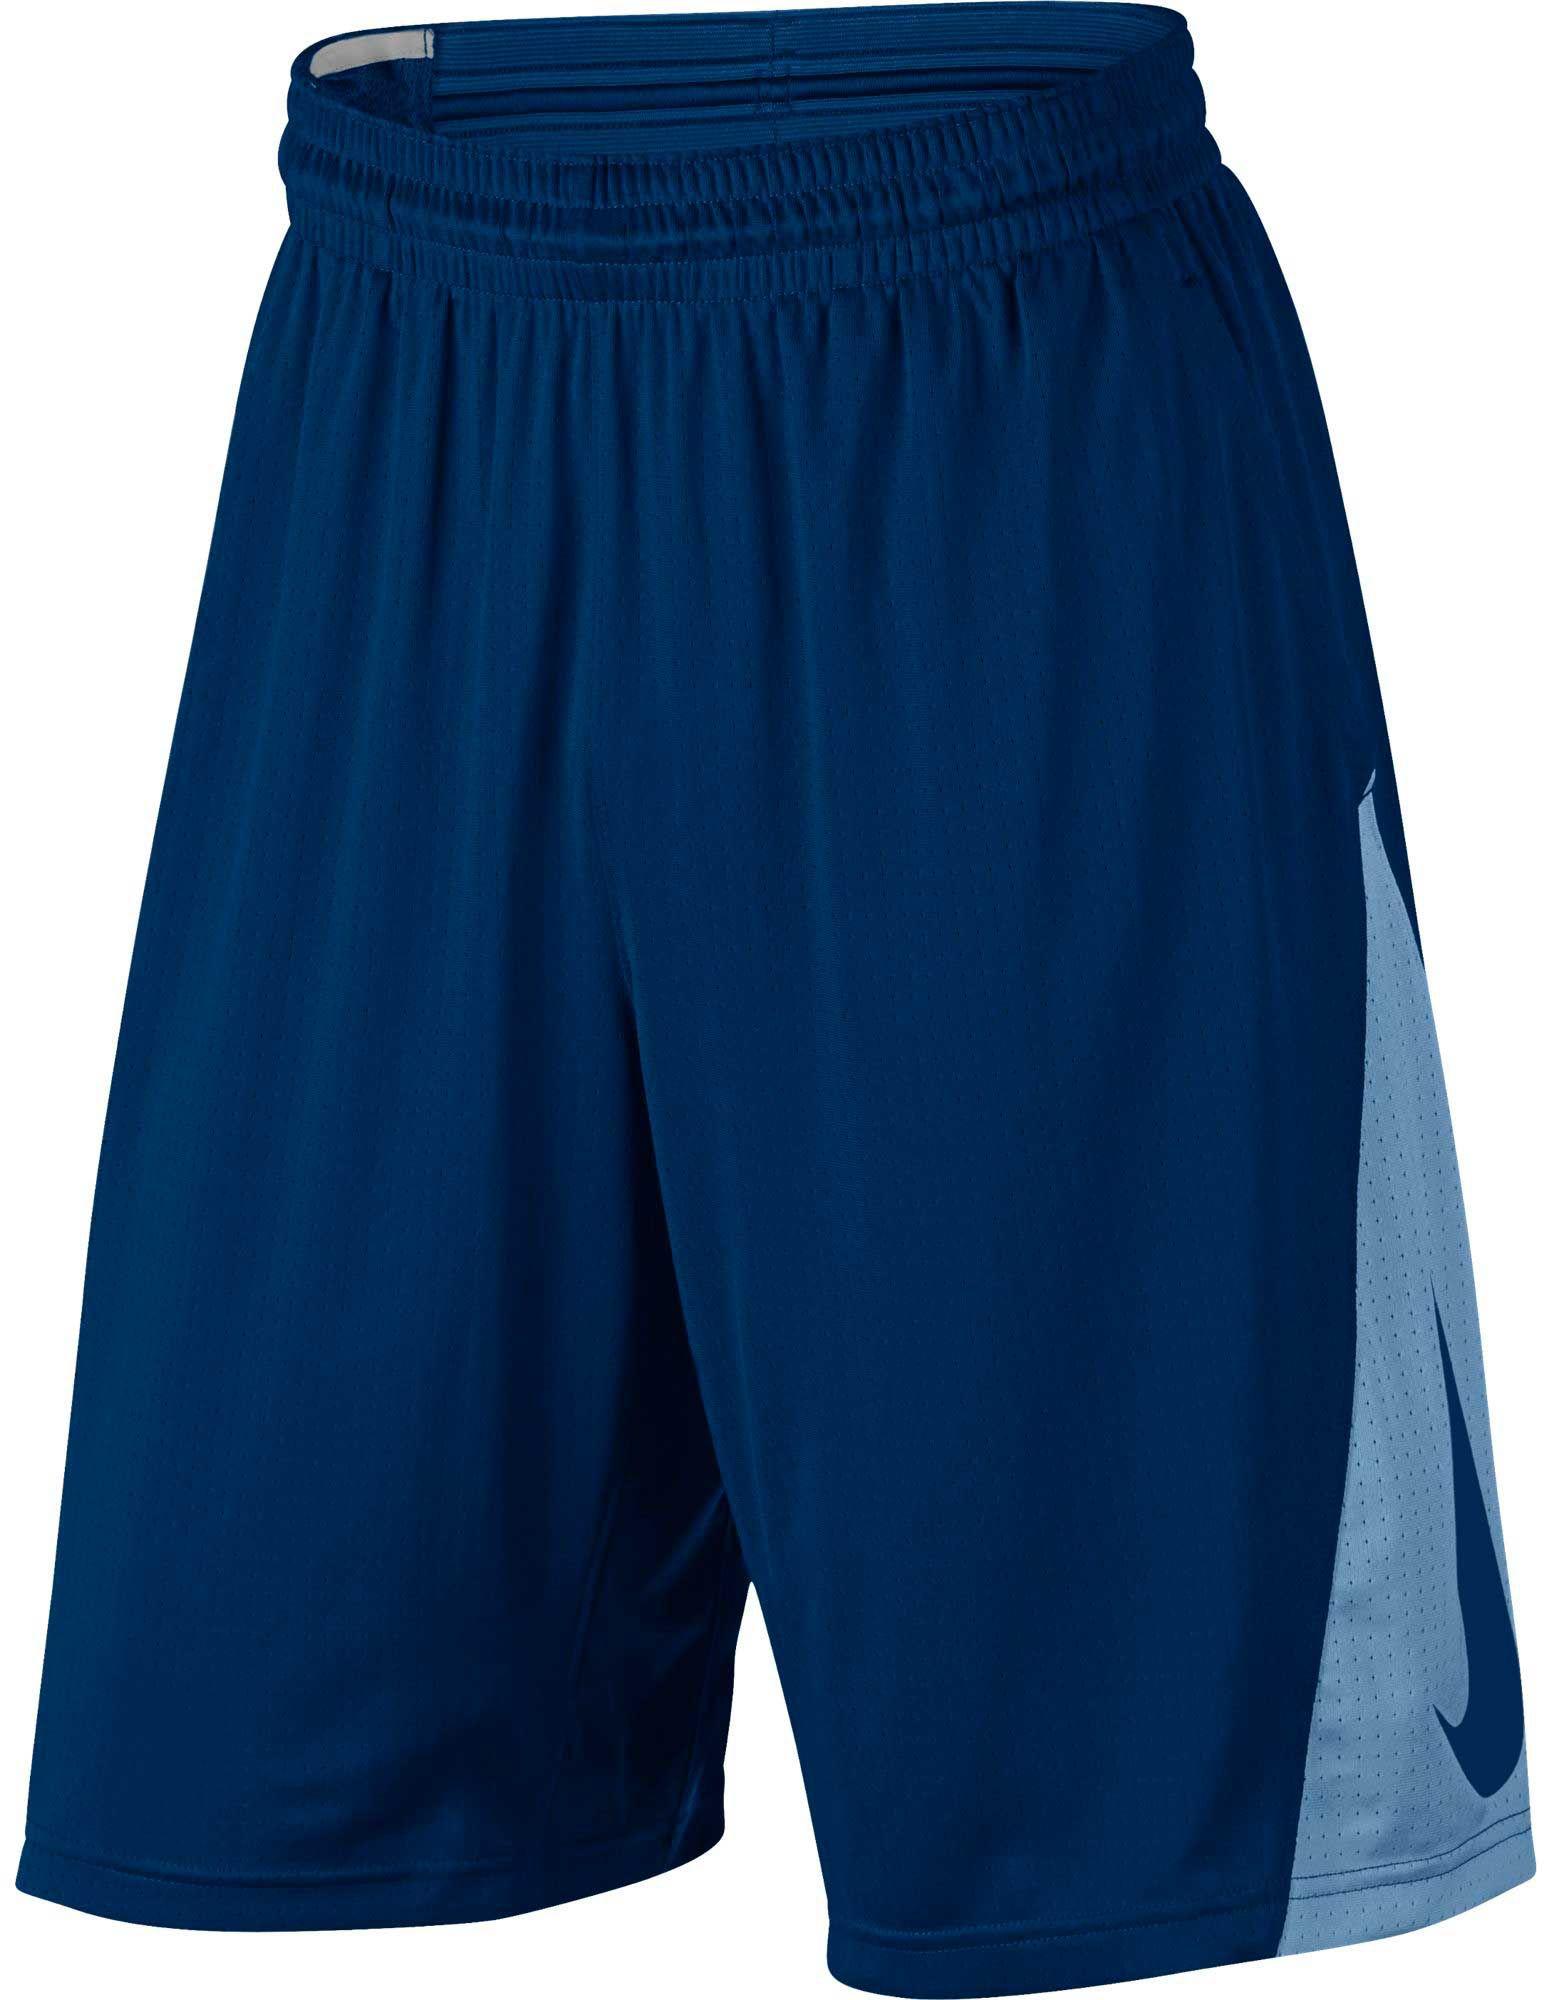 Mens basketball shorts on sale free shipping - Product Image Nike Men S Courtside Basketball Shorts